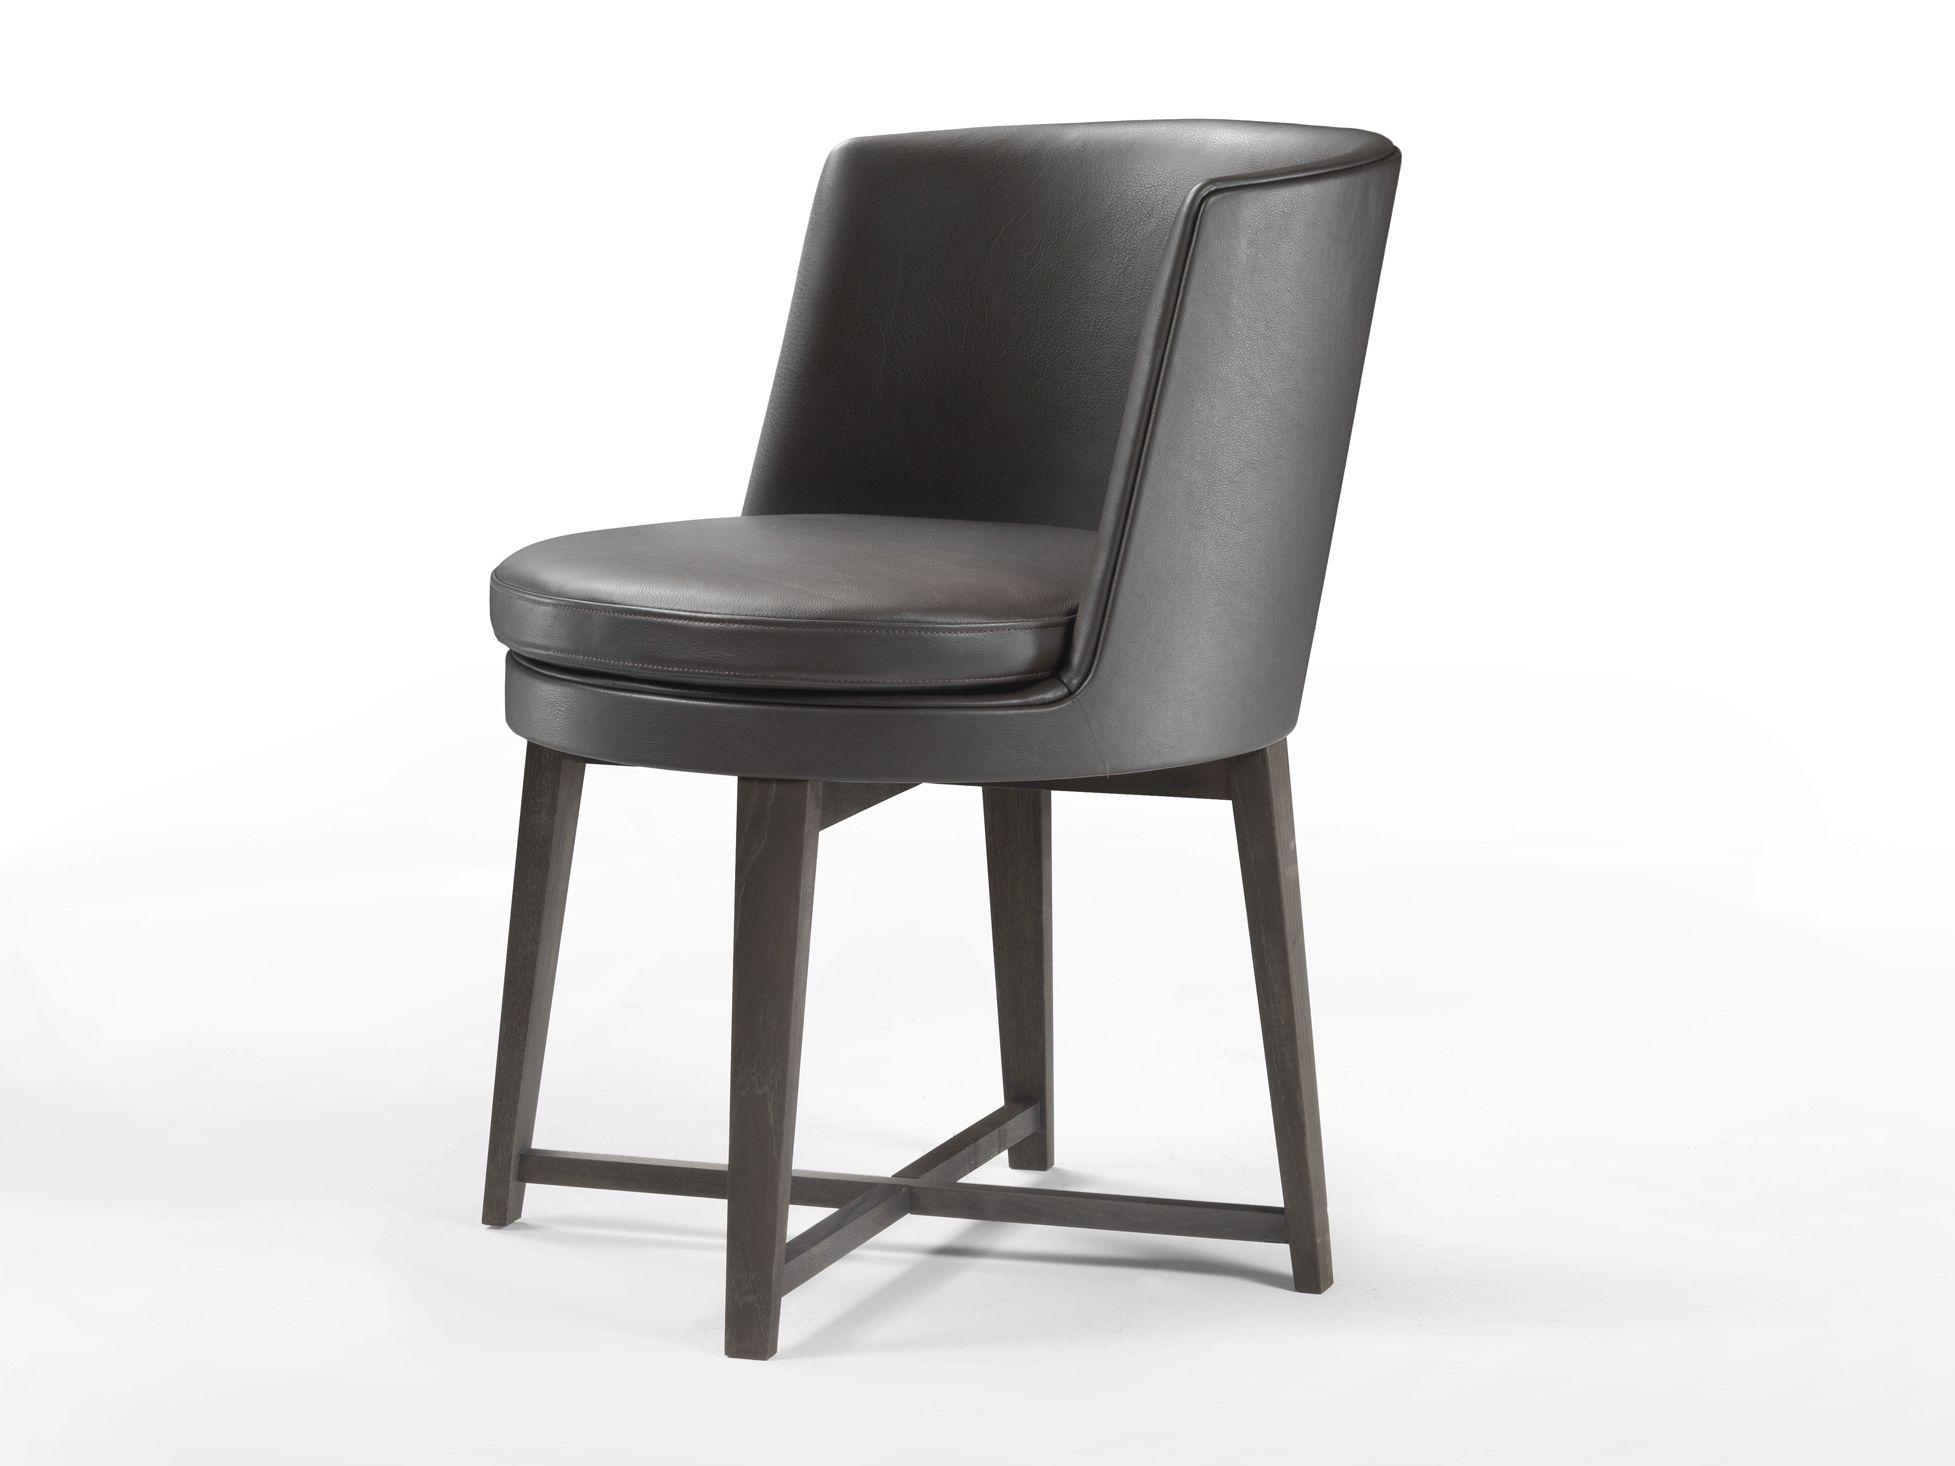 feel good sedia in pelle by flexform design antonio citterio. Black Bedroom Furniture Sets. Home Design Ideas